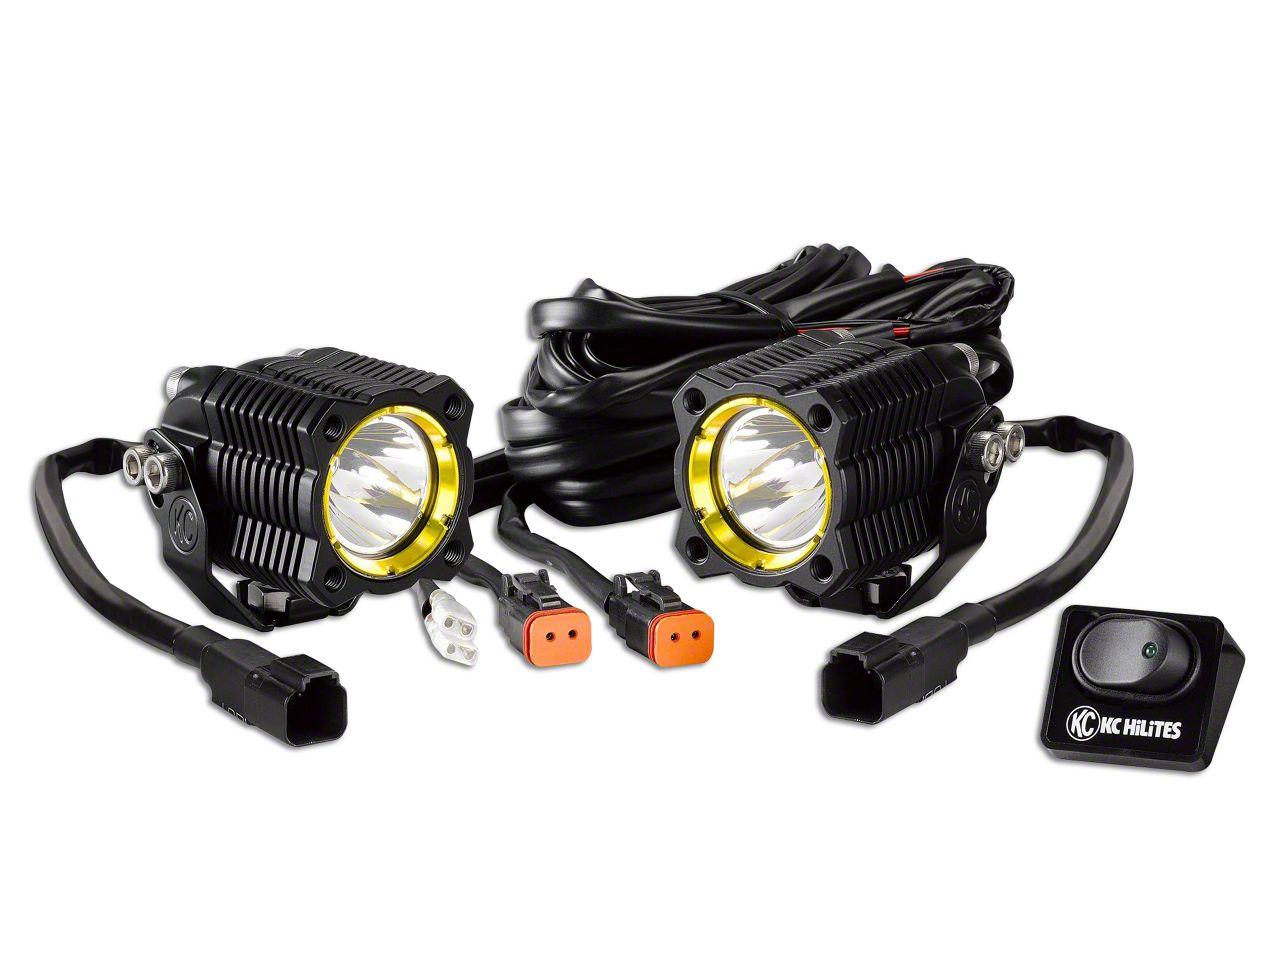 KC HiLiTES Flex Single LED Light - 10W Spread Beam - Pair